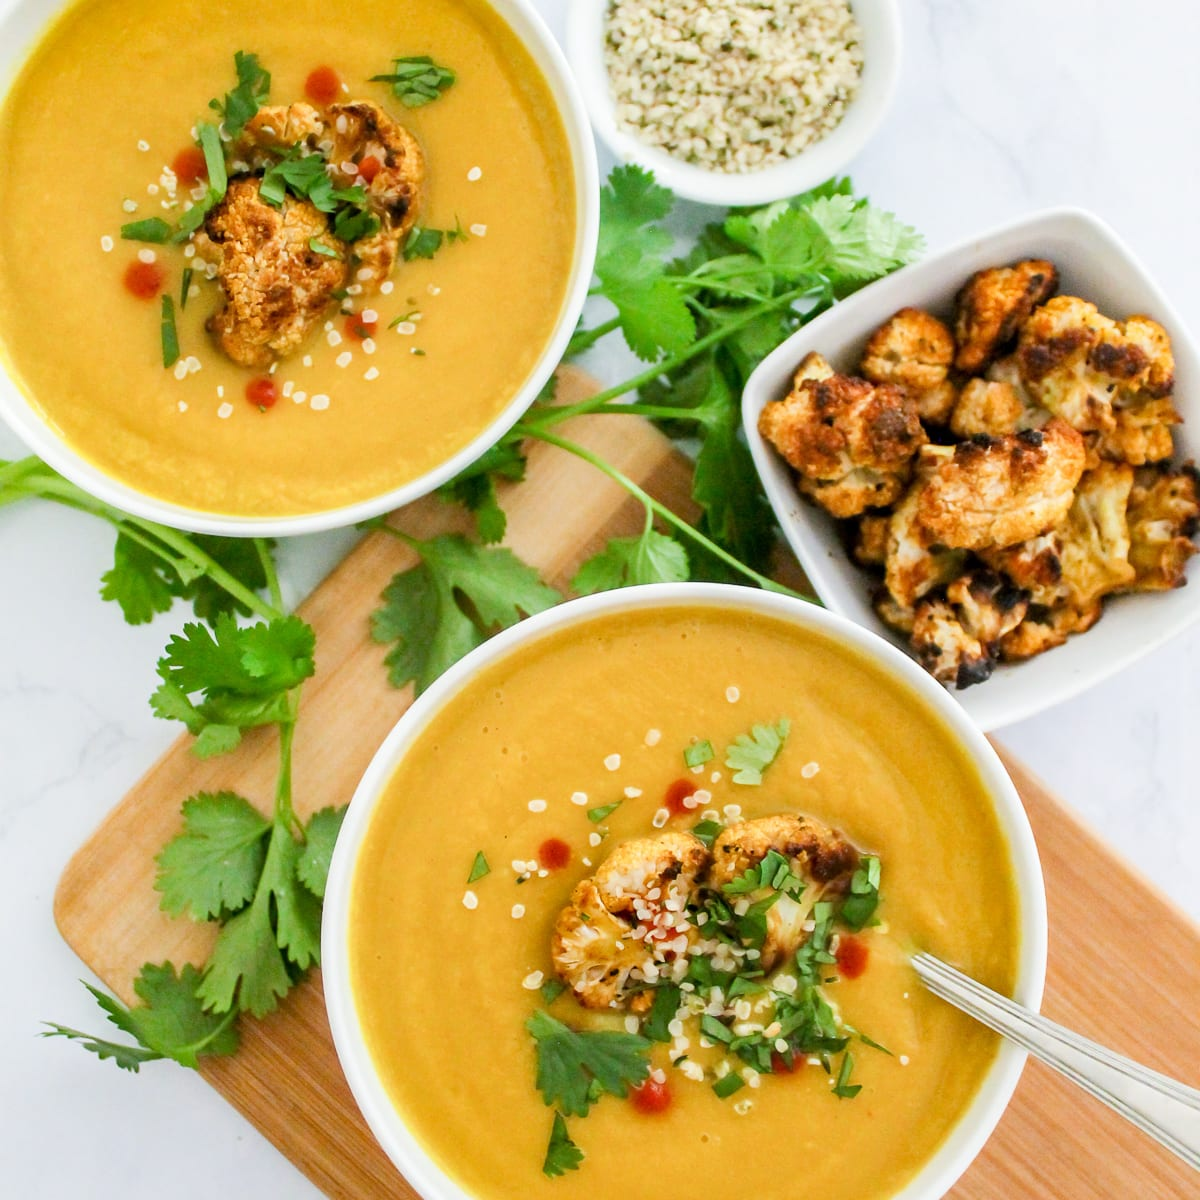 Anti-Inflammatory Creamy Curried Cauliflower Soup | vegan, paleo, dairy free and gluten free, this anti-inflammatory soup is a must-make! | My Fresh Perspective | #paleo #vegan #dairyfree #antiinflammatory #eatclean